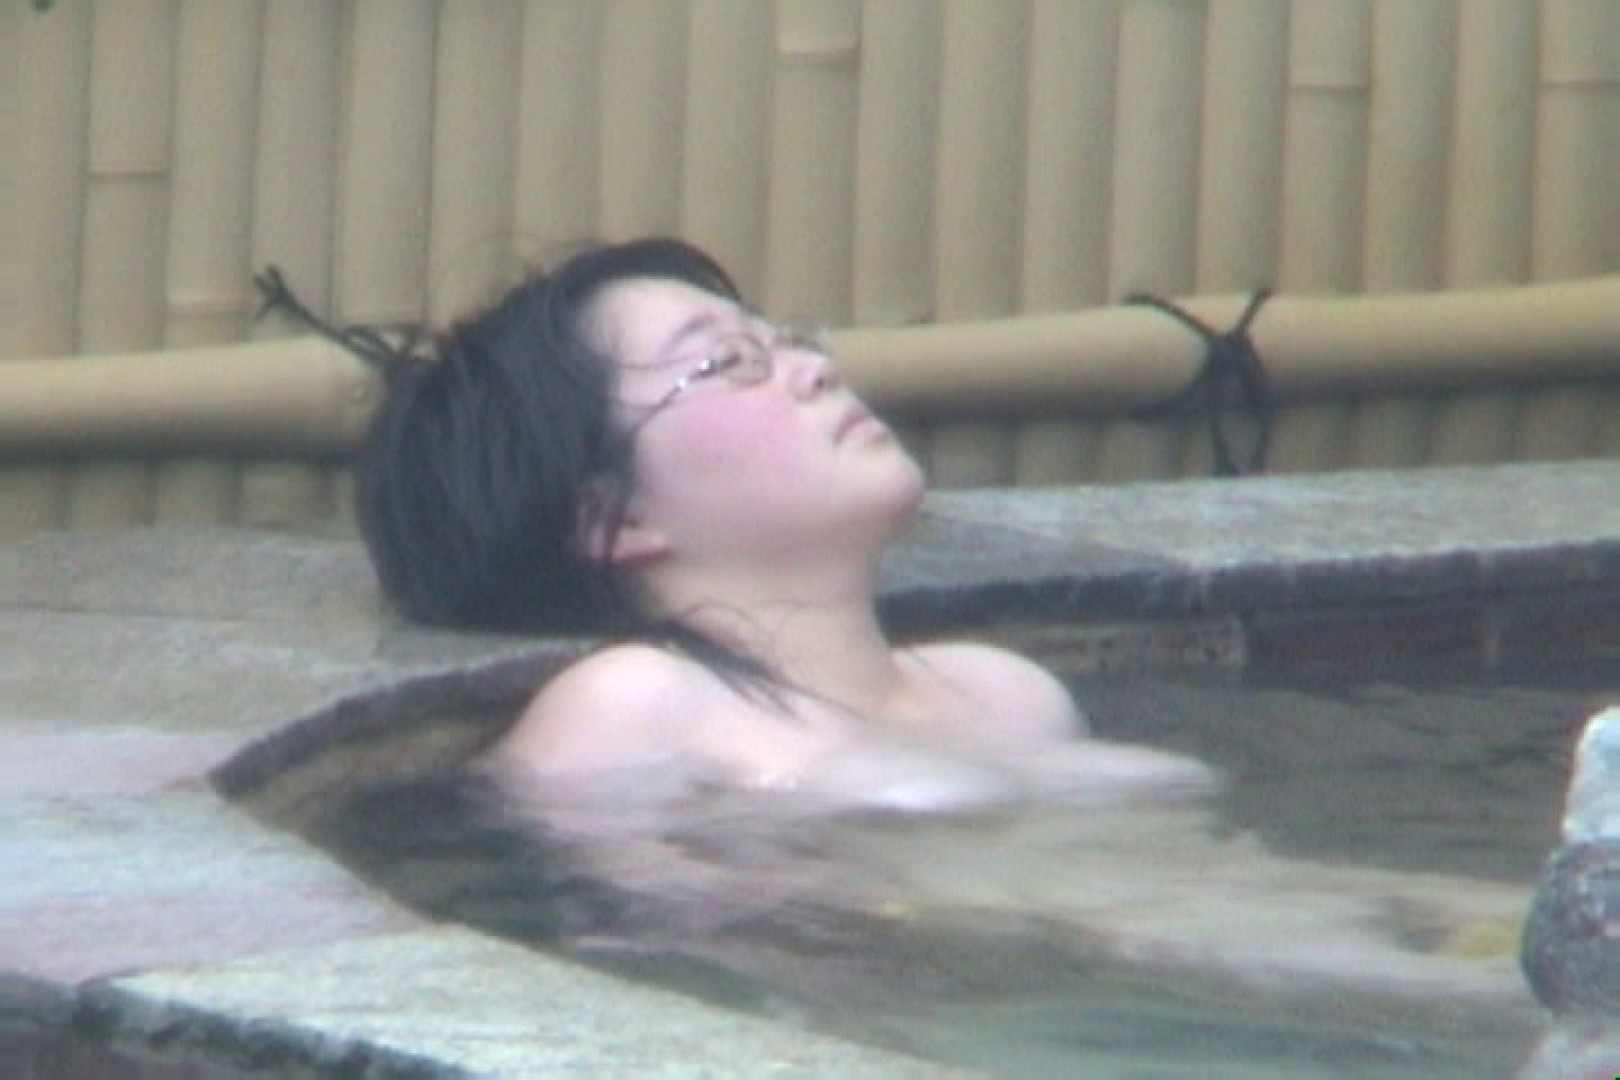 Aquaな露天風呂Vol.46【VIP限定】 OL女体 アダルト動画キャプチャ 98連発 14